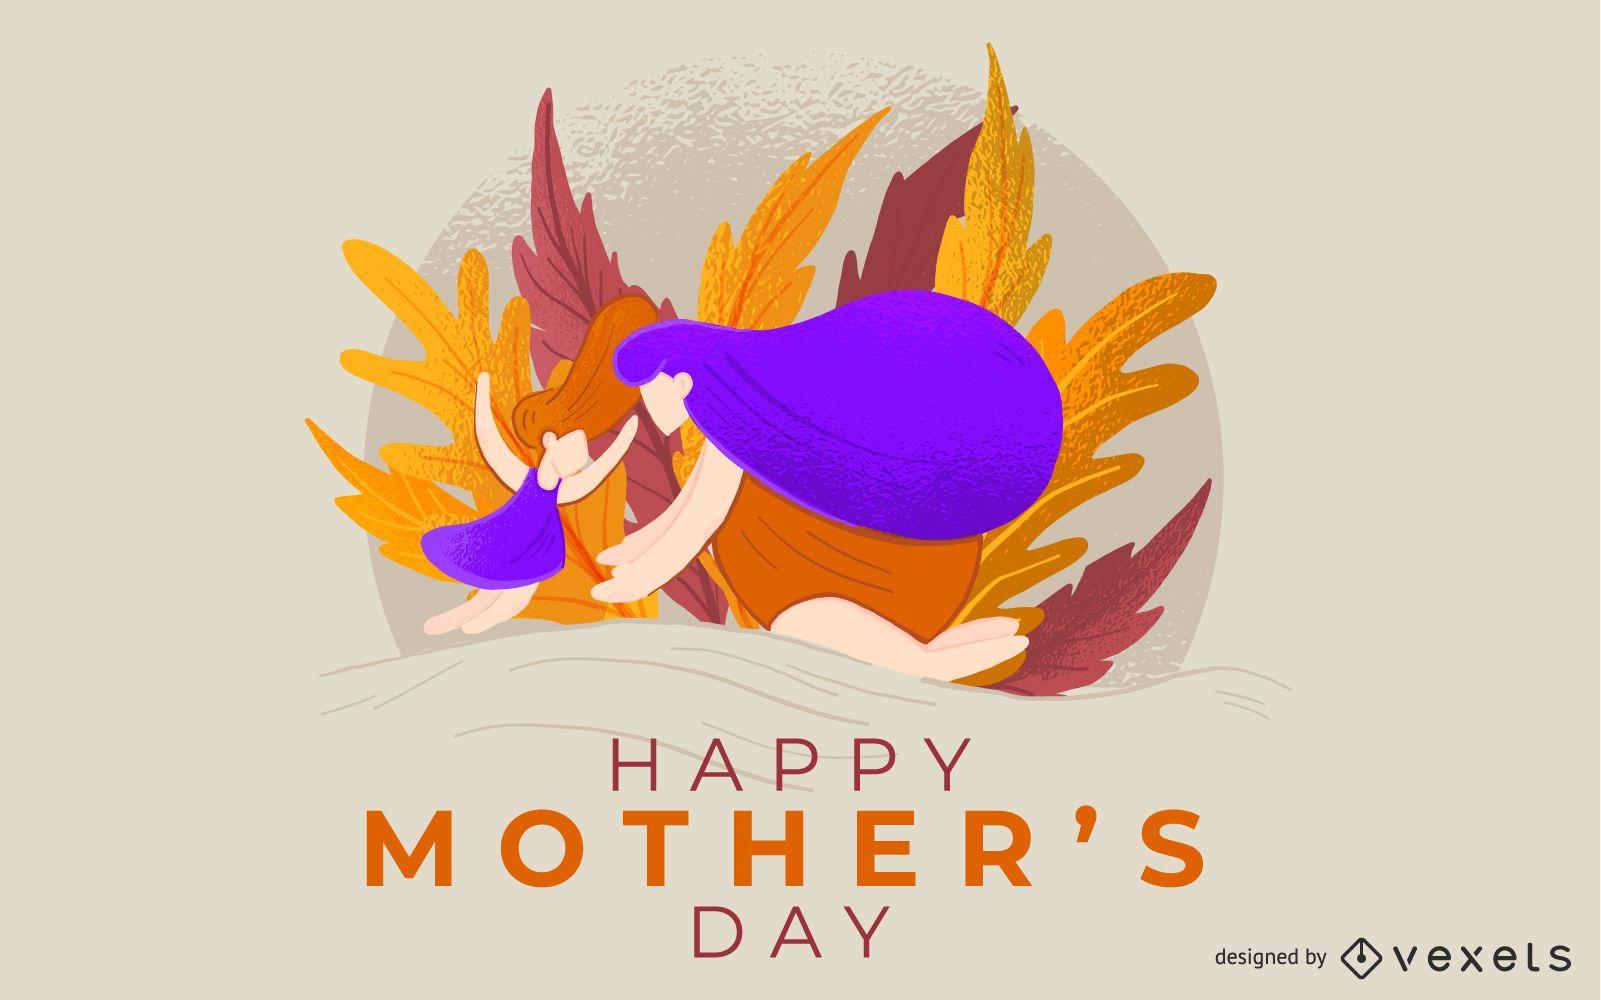 Happy Mother's Day Illustration Design